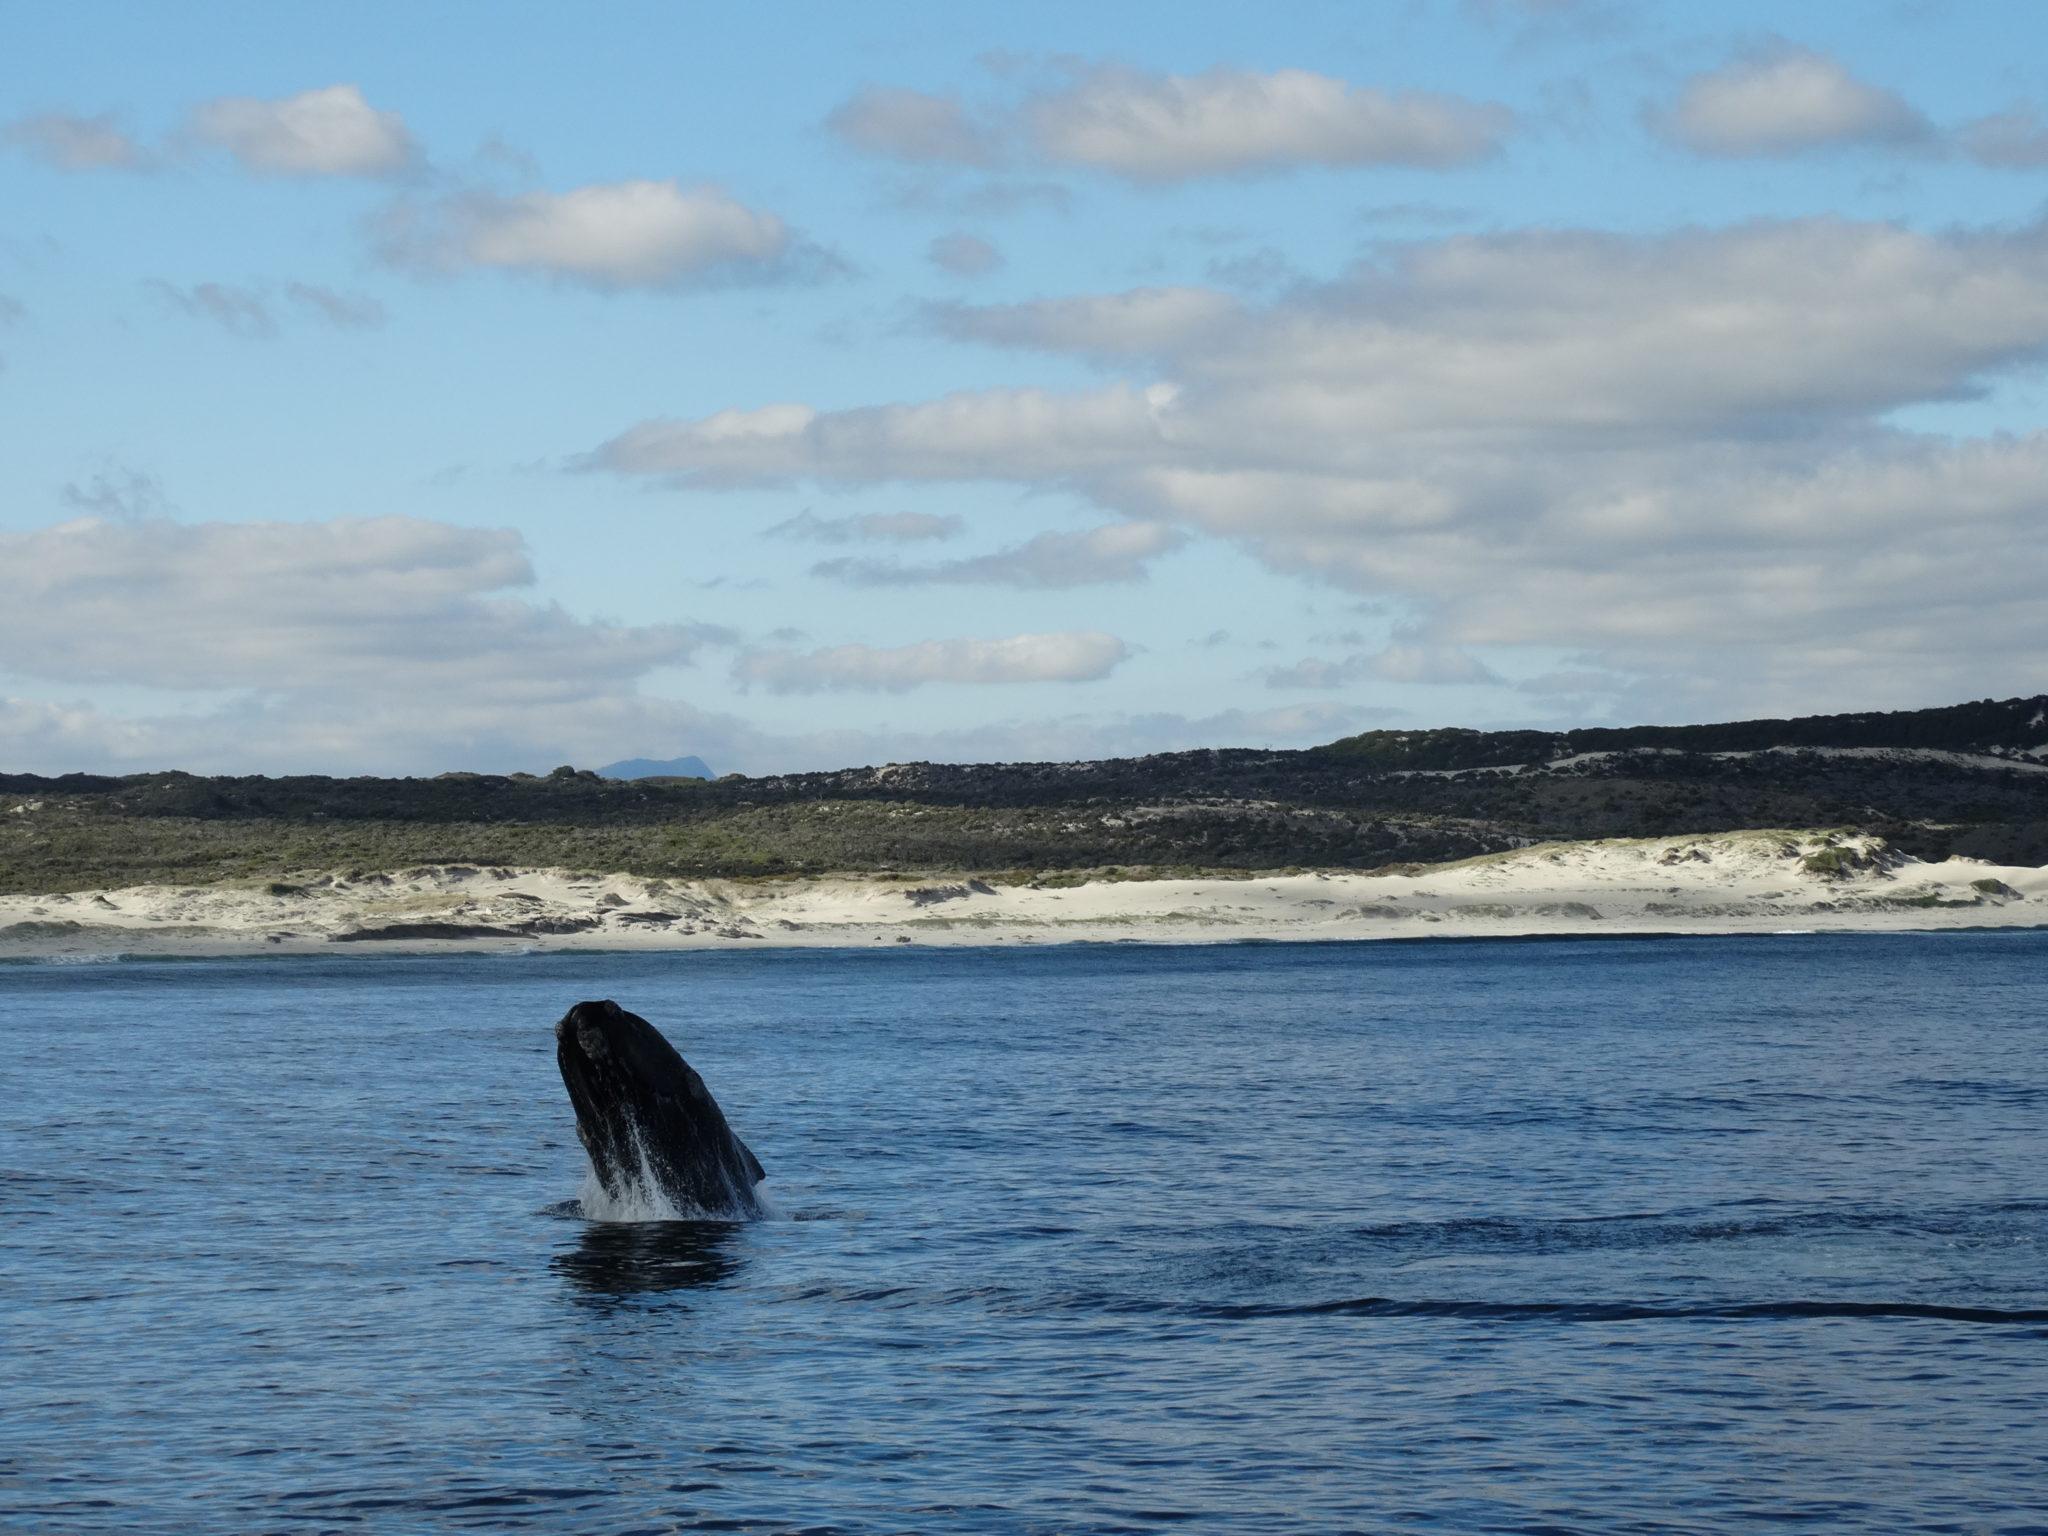 Whale And Cheetah Tour – Cape Town Day Tour